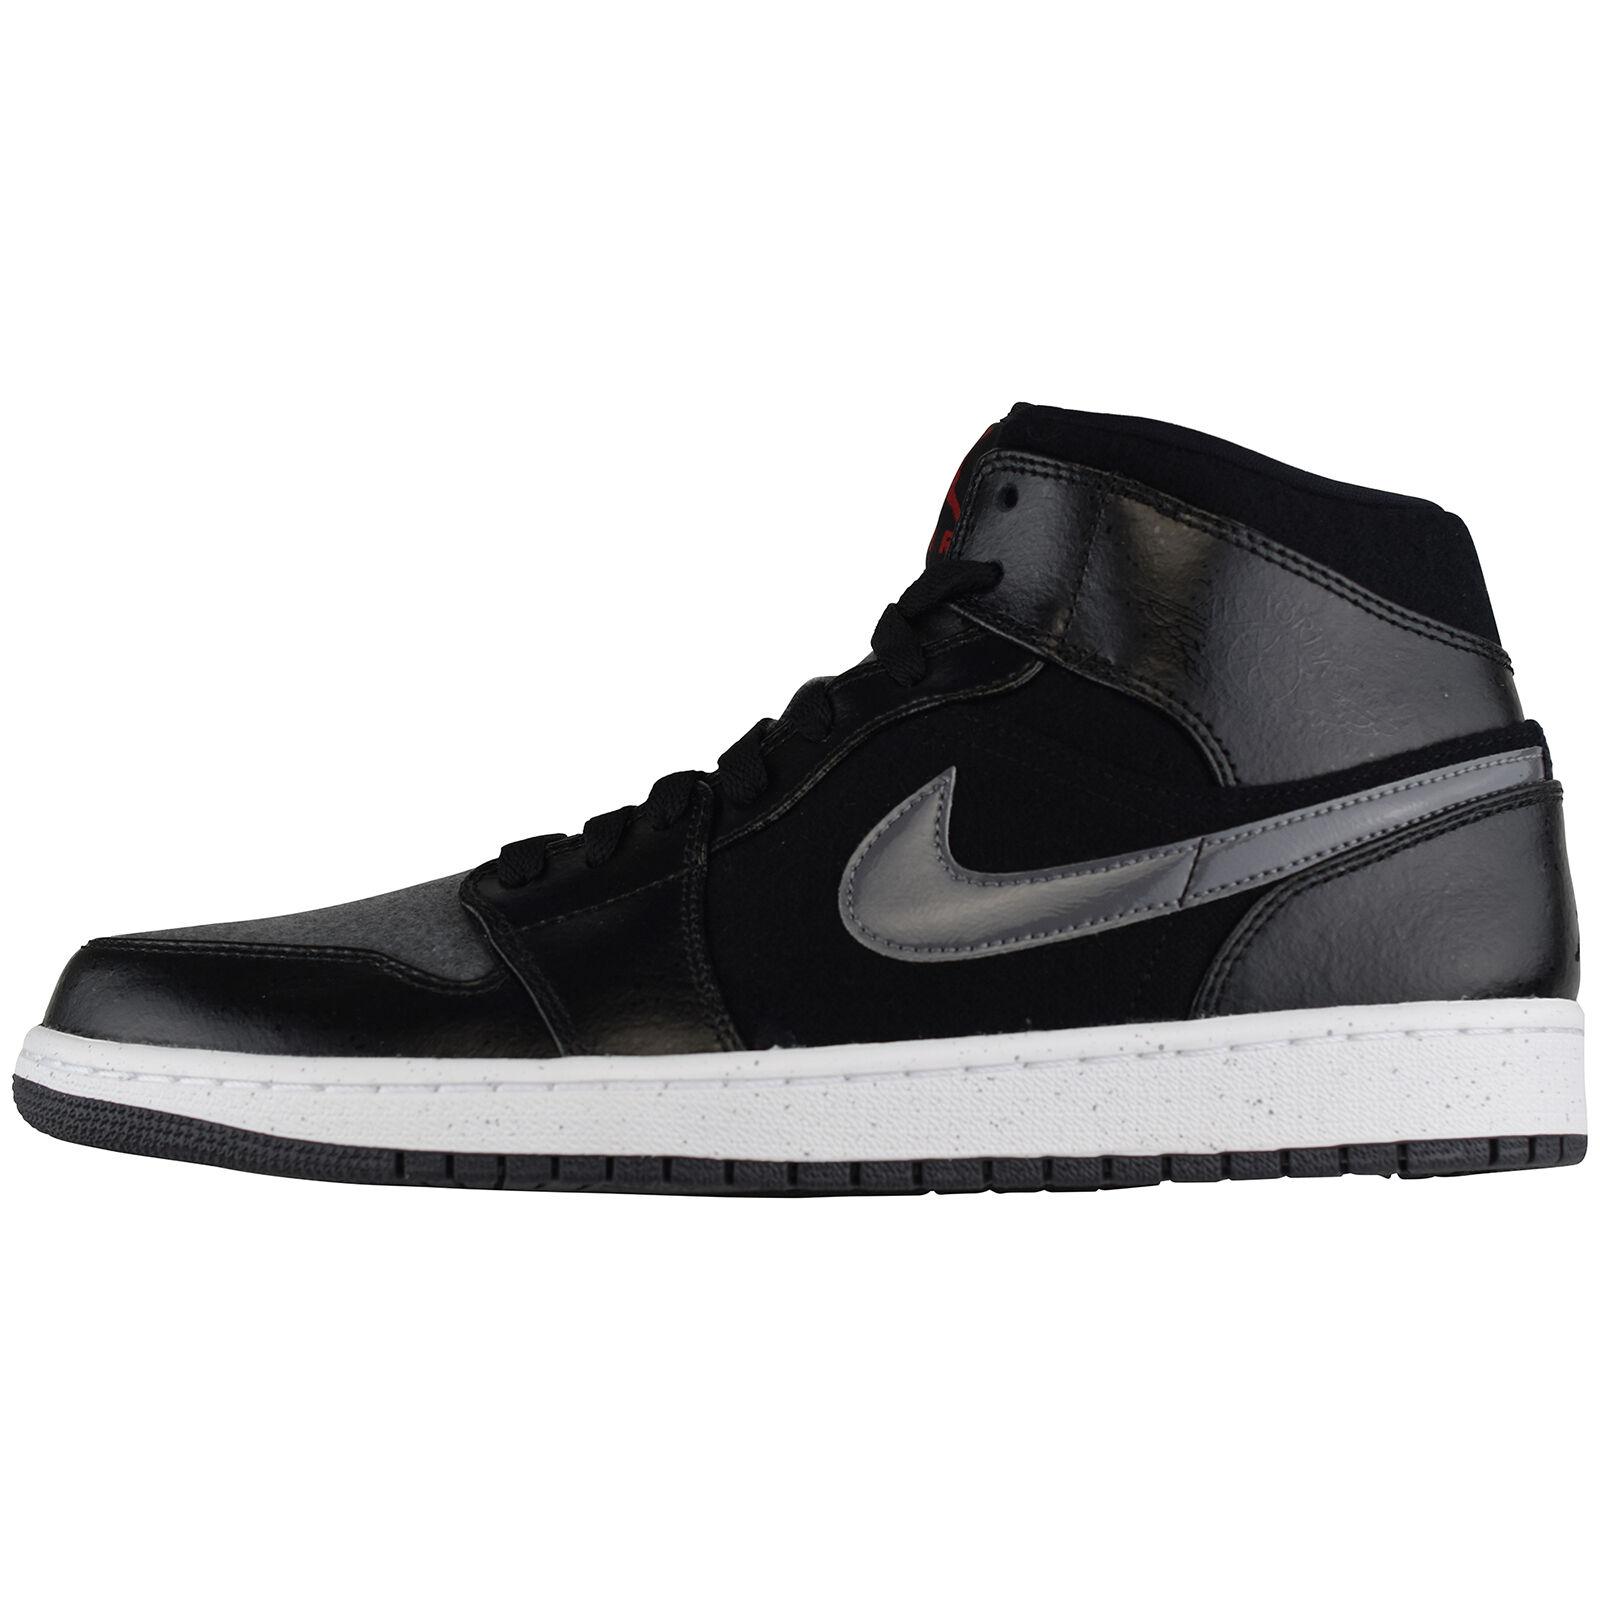 Nike Air Jordan 1 MID PREM 852542-001 Basketball Laufschuhe Run Freizeit Turnschuhe Ausgezeichnete Qualität